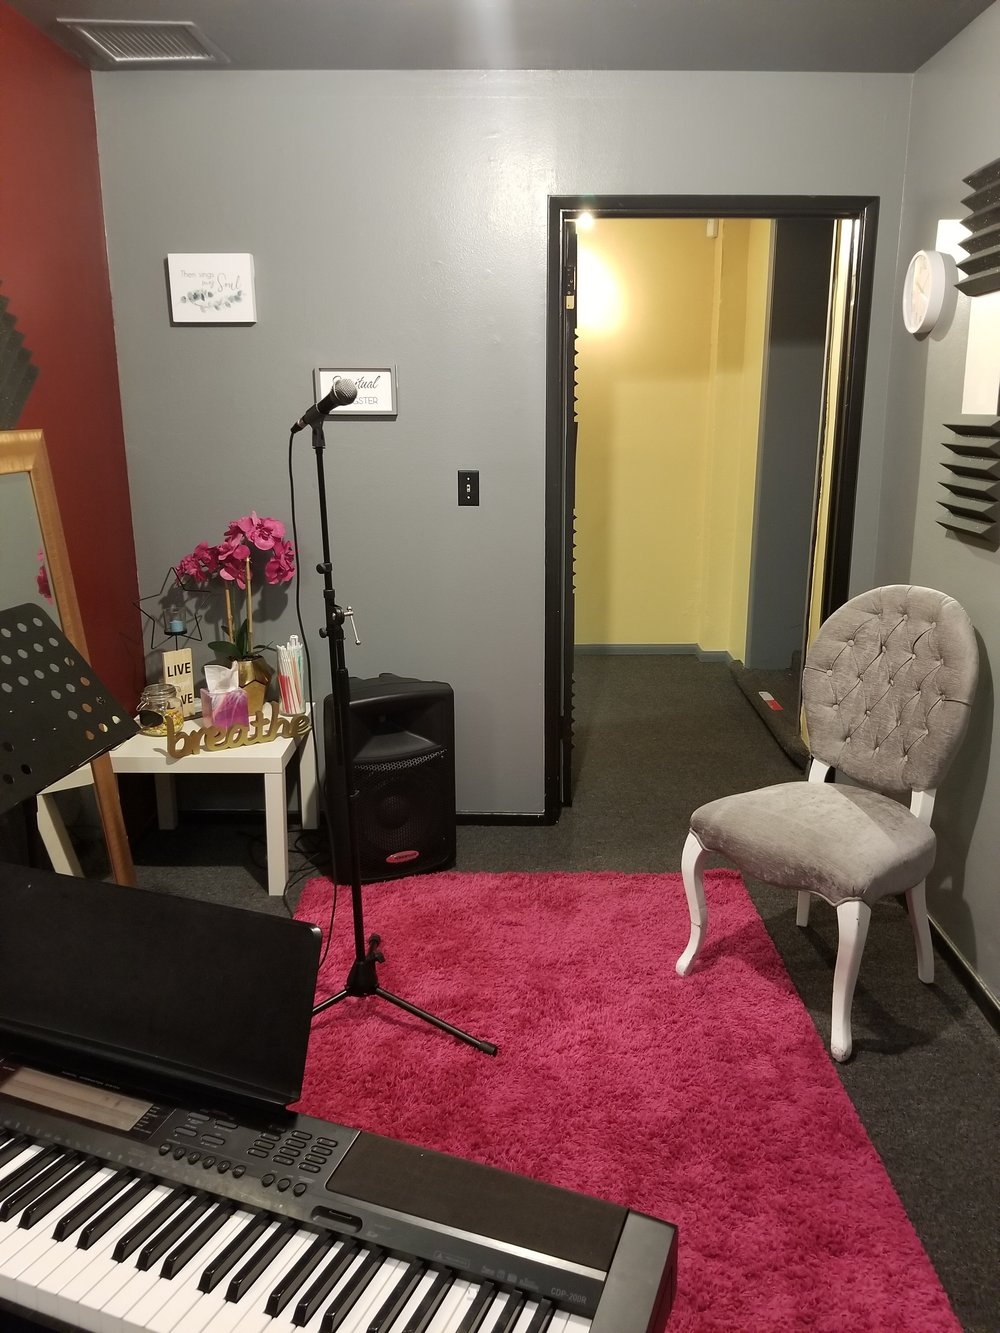 Singers' room - Where the Magic Happens!